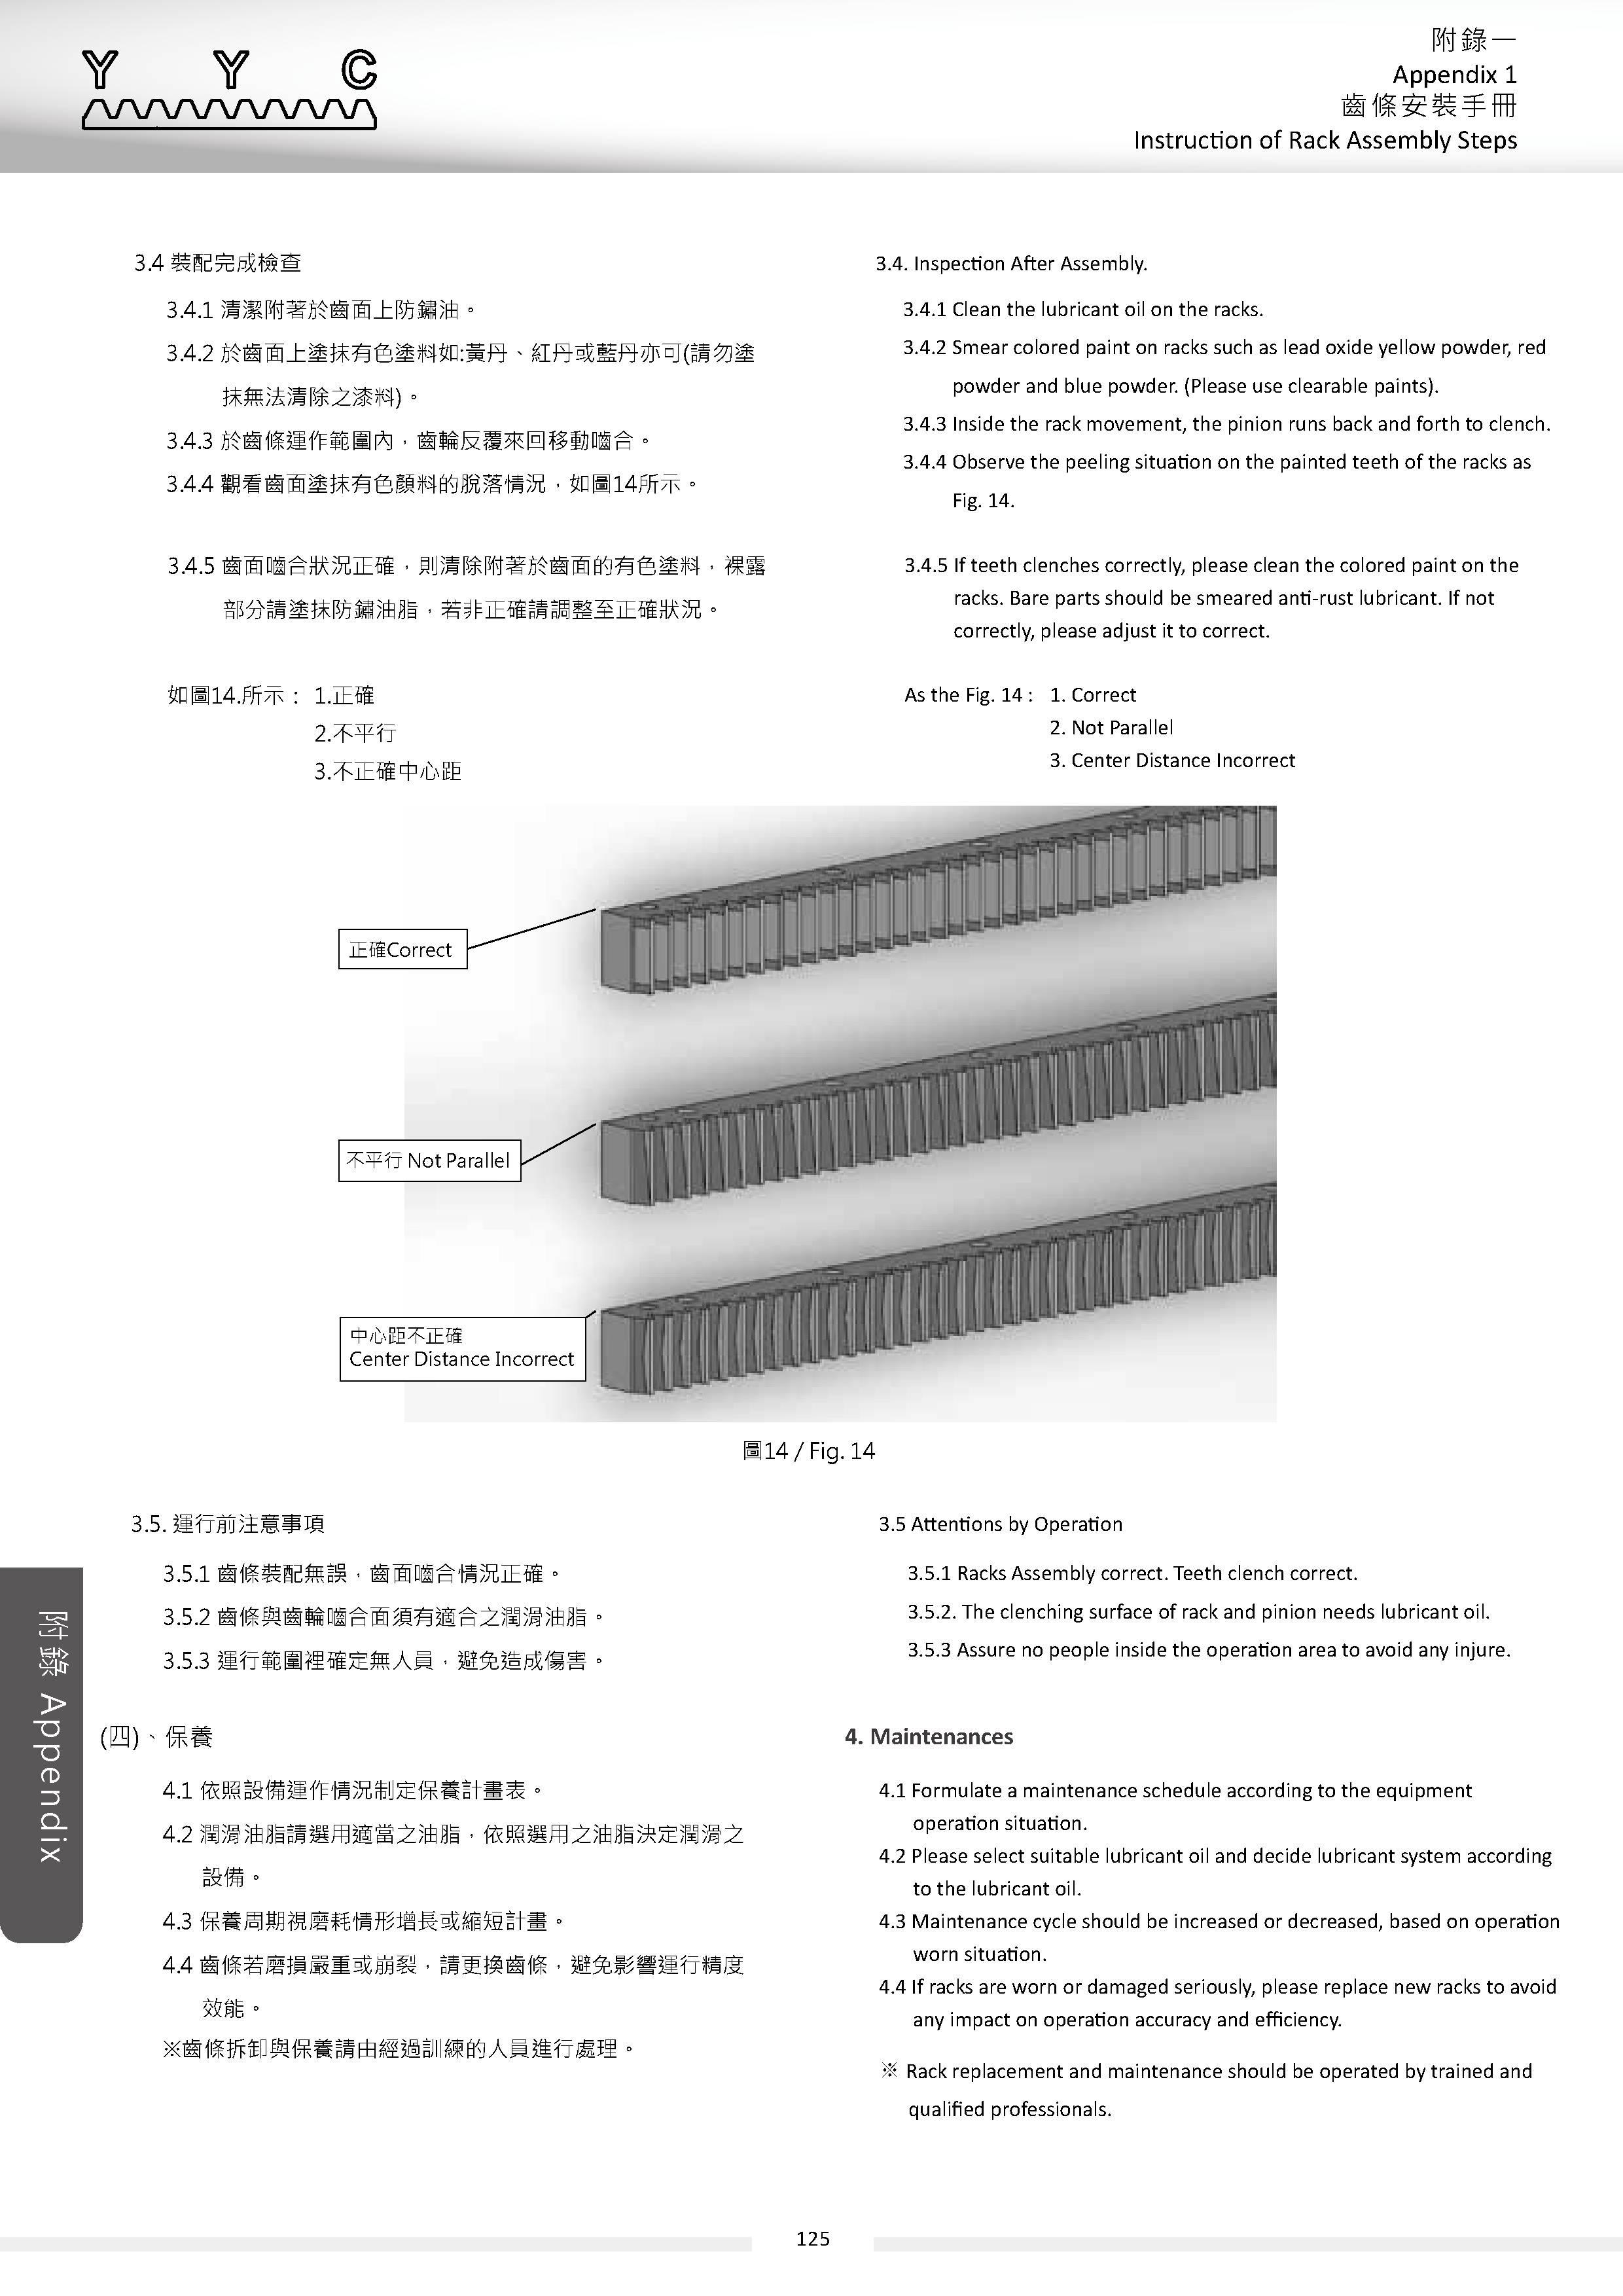 Instruction of Rack Assembly Steps 齒條安裝手冊7